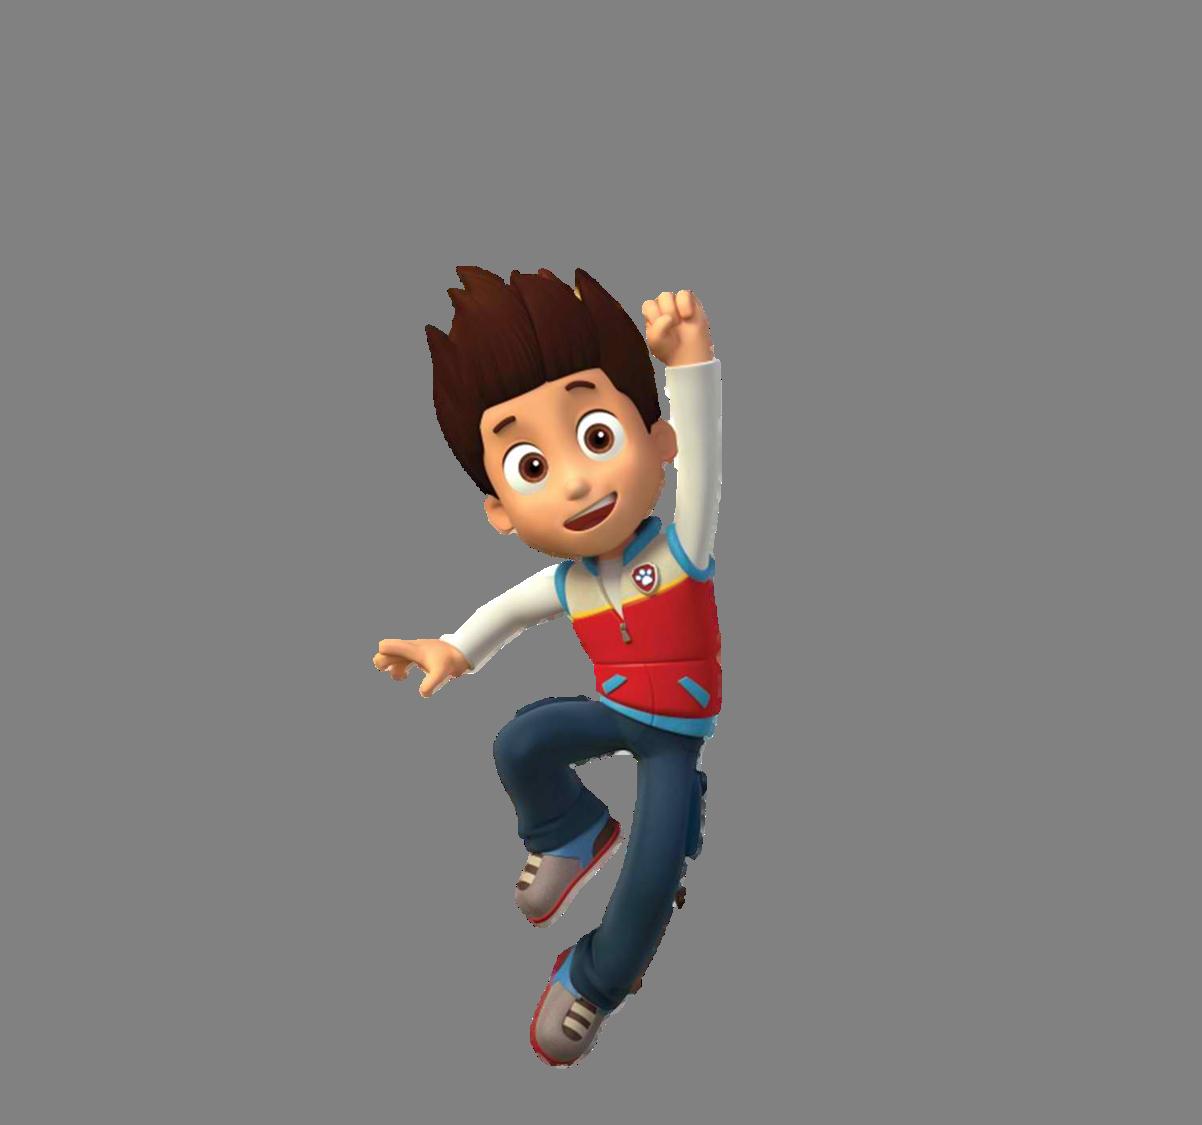 Ryder der.png - Boy Jumping PNG HD